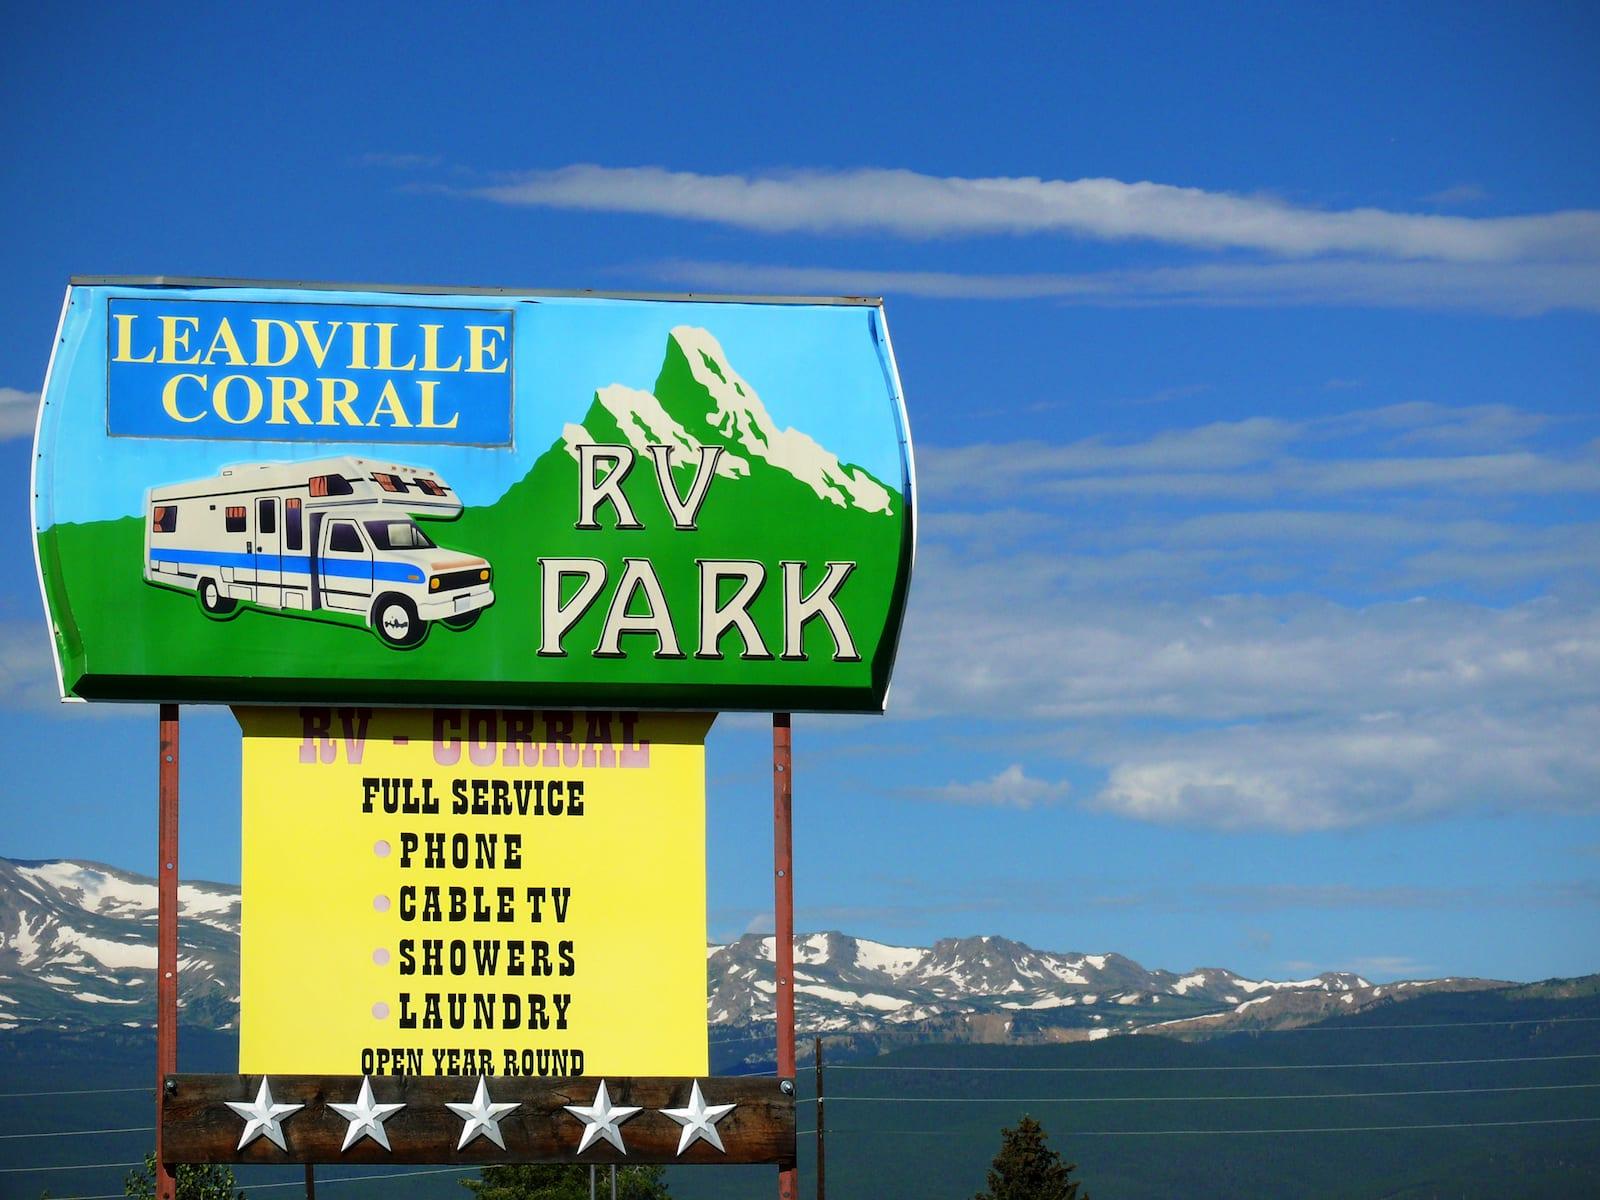 Leadville Corral RV Park